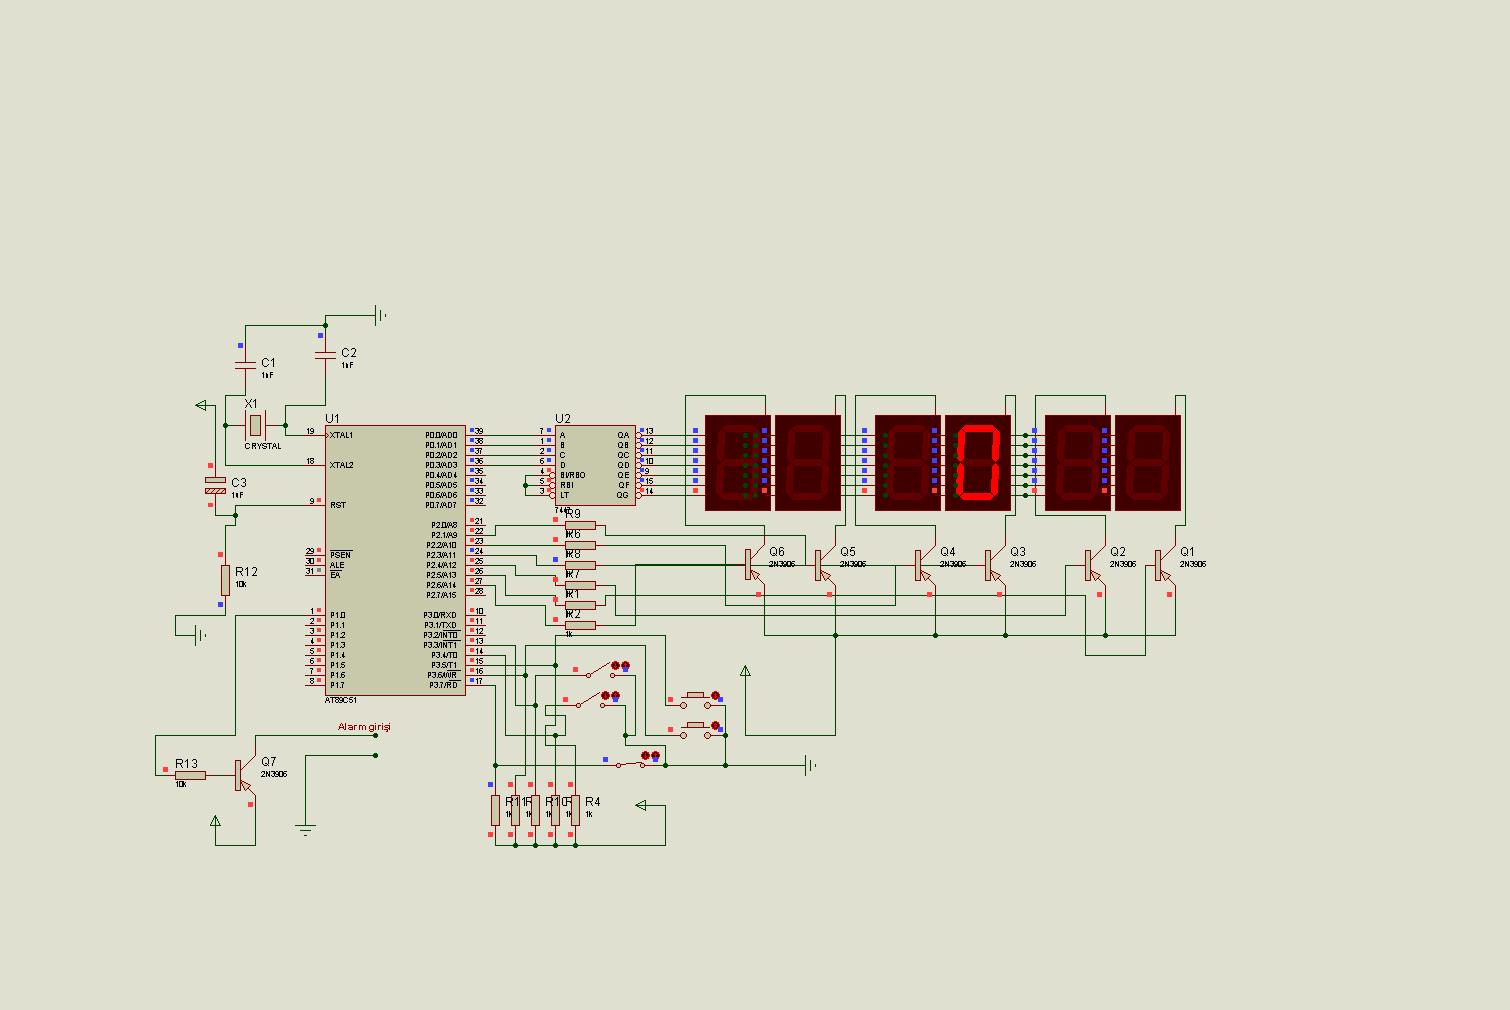 DIGITAL CLOCK SCHEMATIC DIAGRAM (2) - ATMega32 AVR